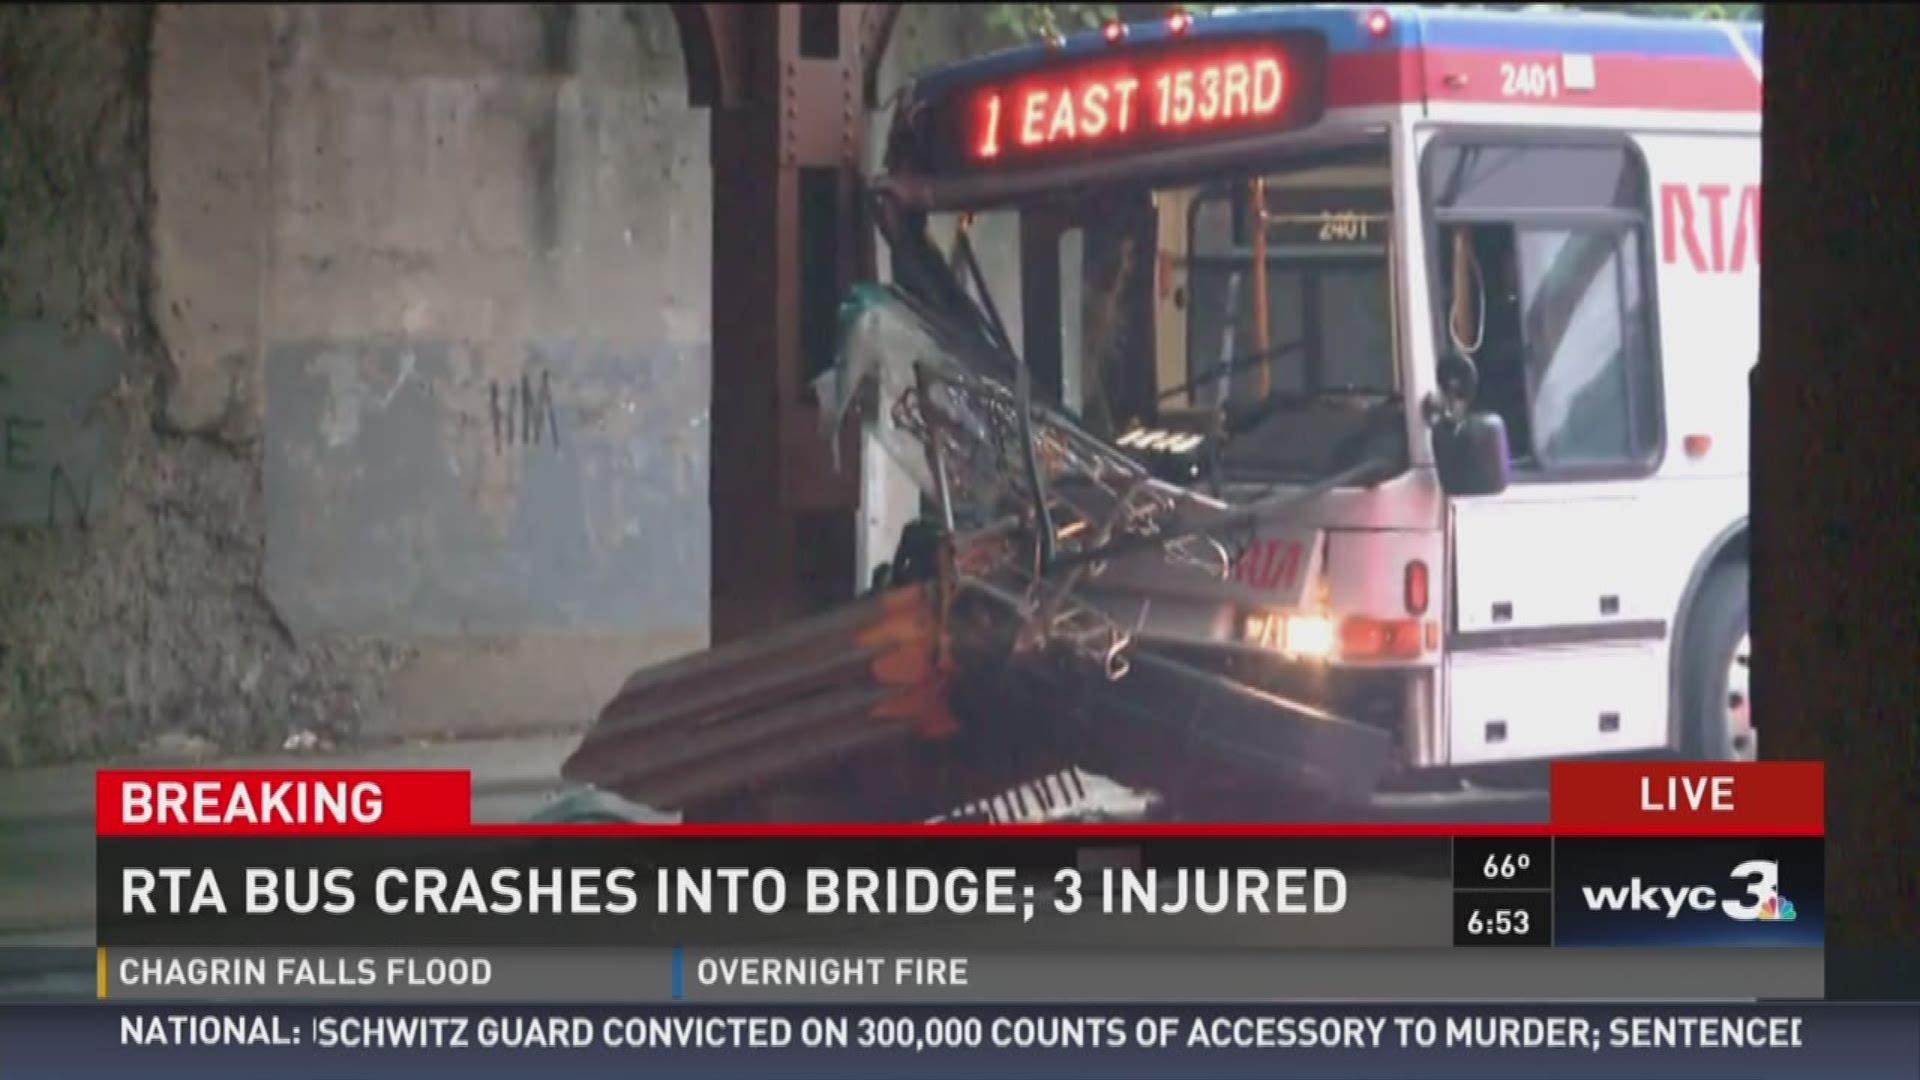 RTA Bus Crash Into Bridge